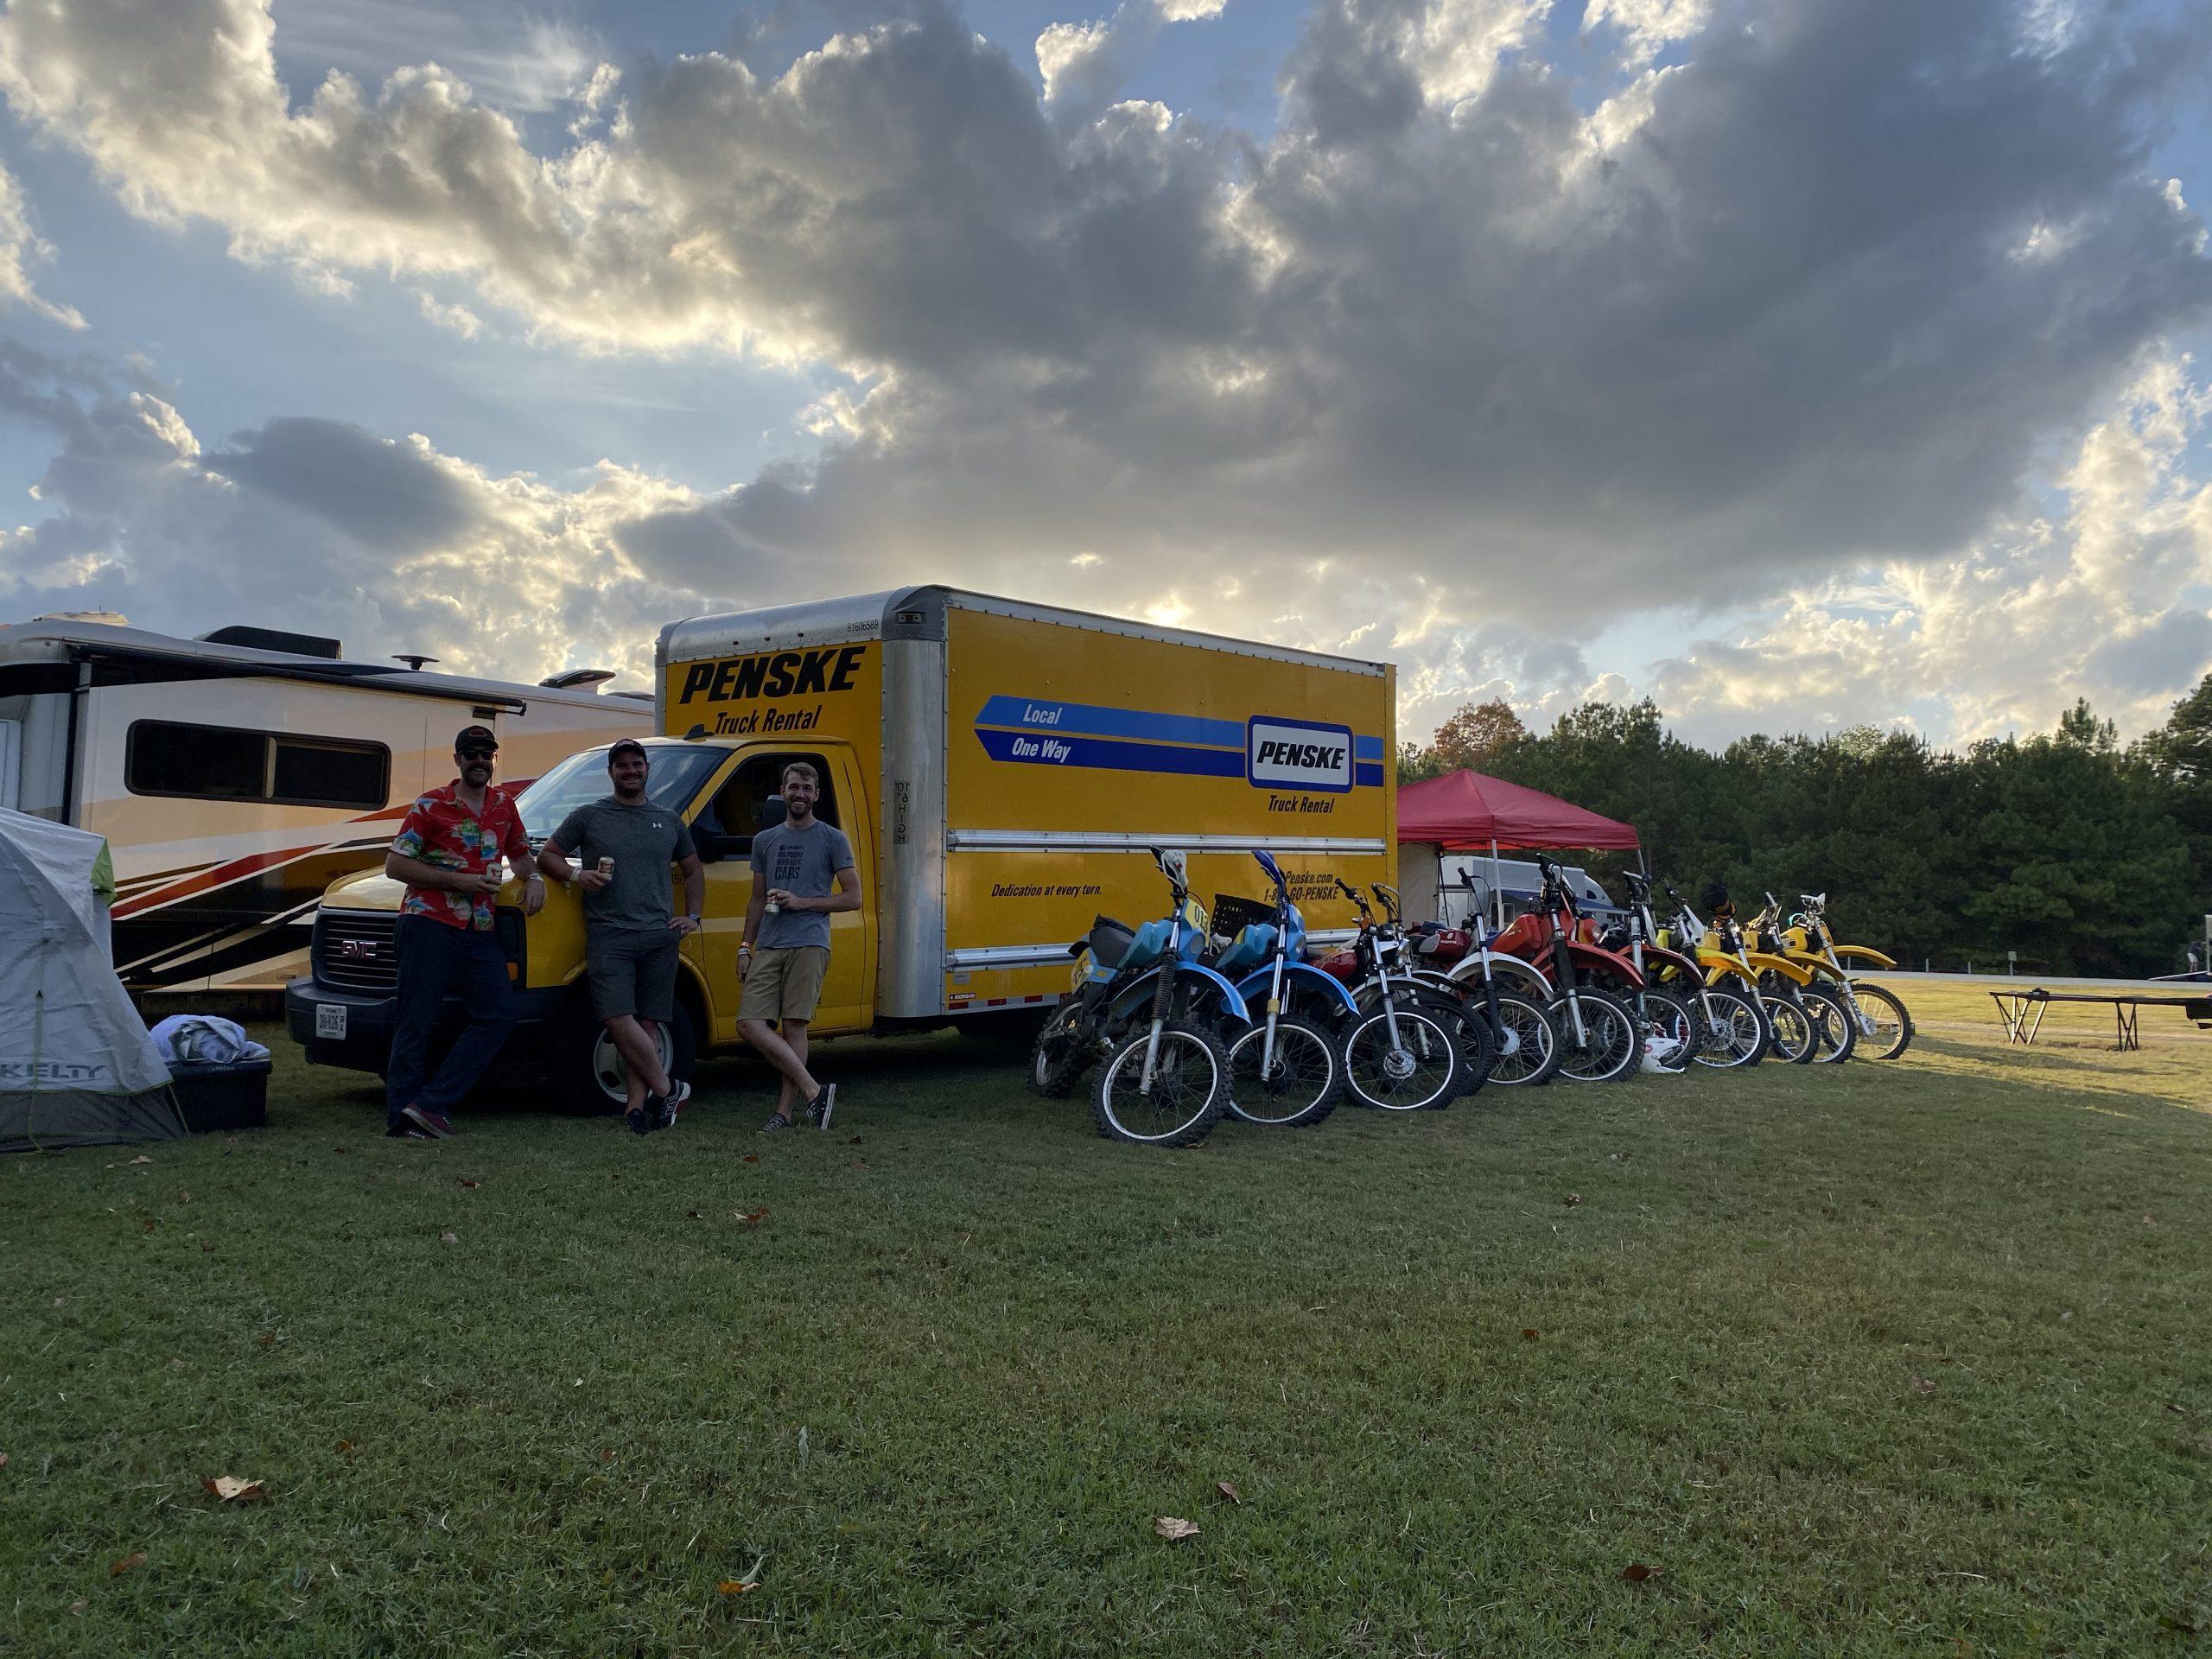 2019 Barber Vintage Festival Bikes in Row Three Friends